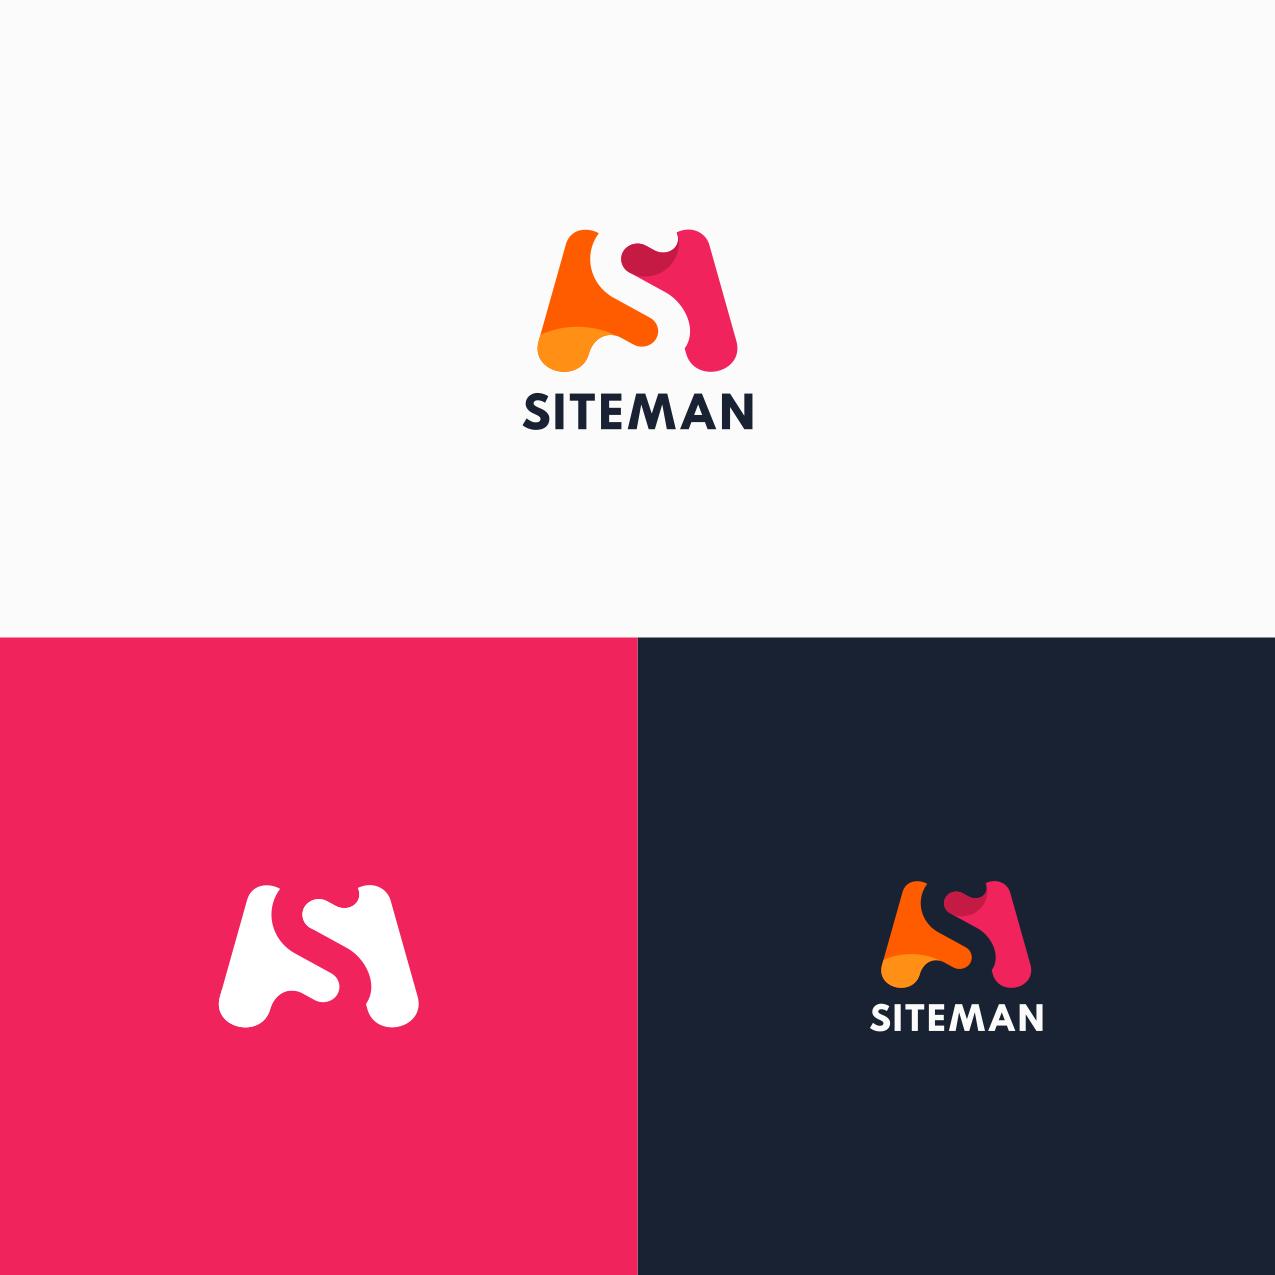 A logo design using negative space